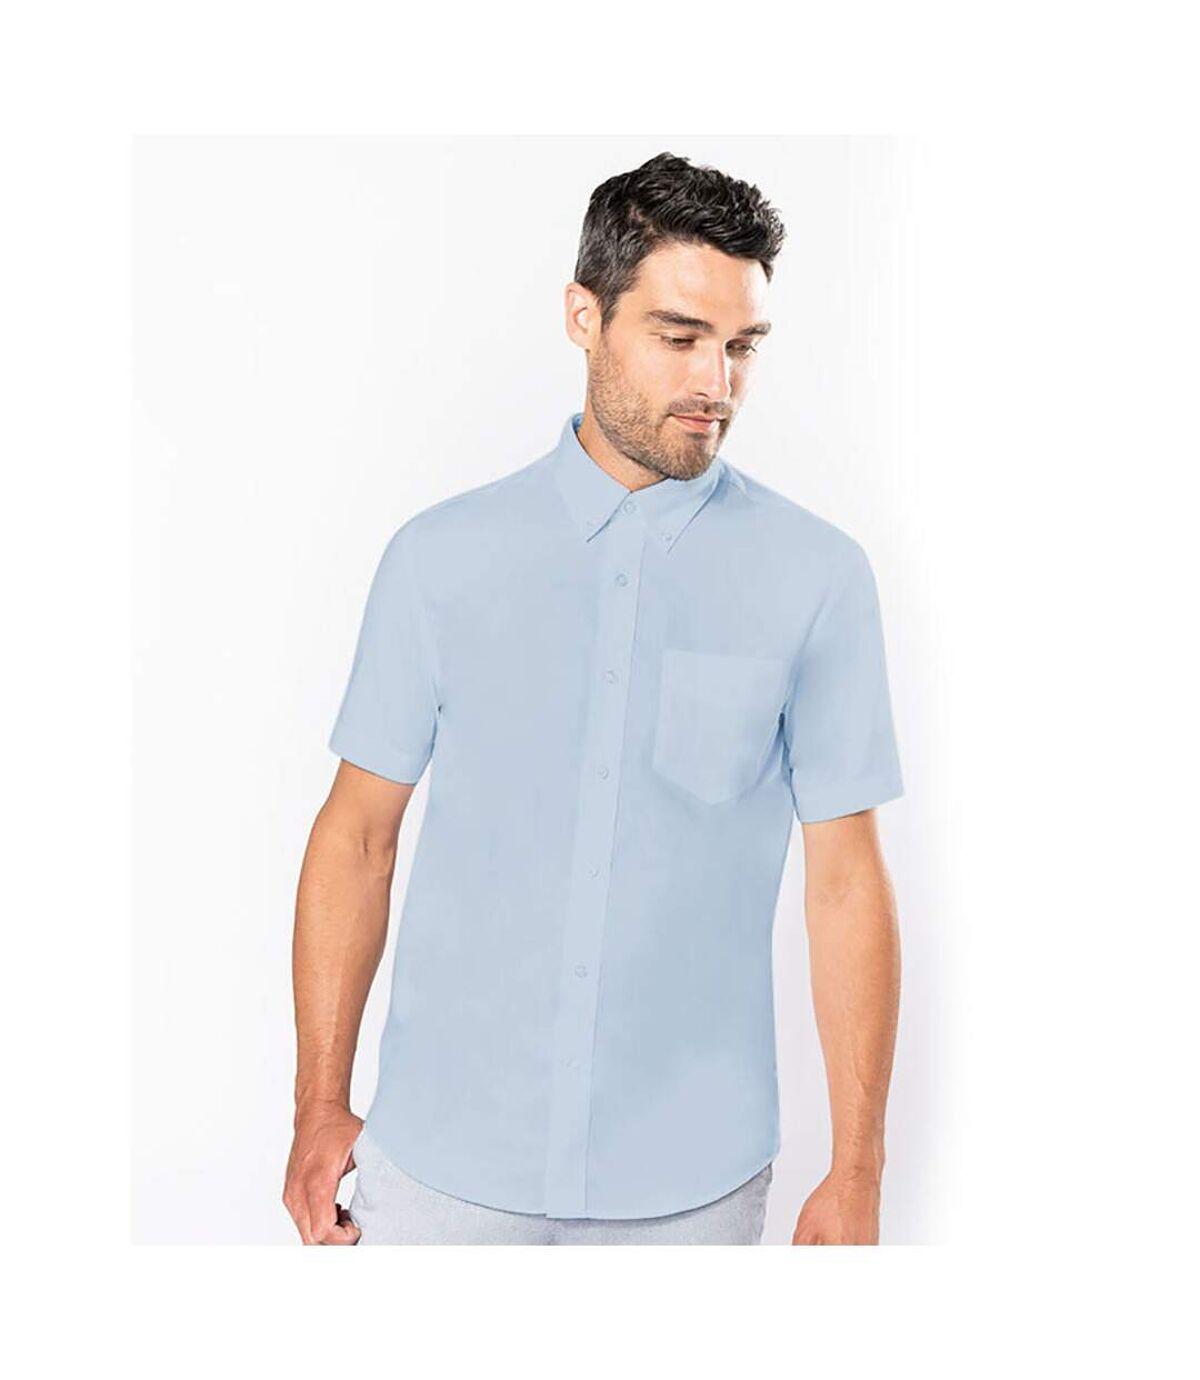 Kariban Mens Short Sleeve Easy Care Oxford Shirt (Oxford Blue) - UTRW721